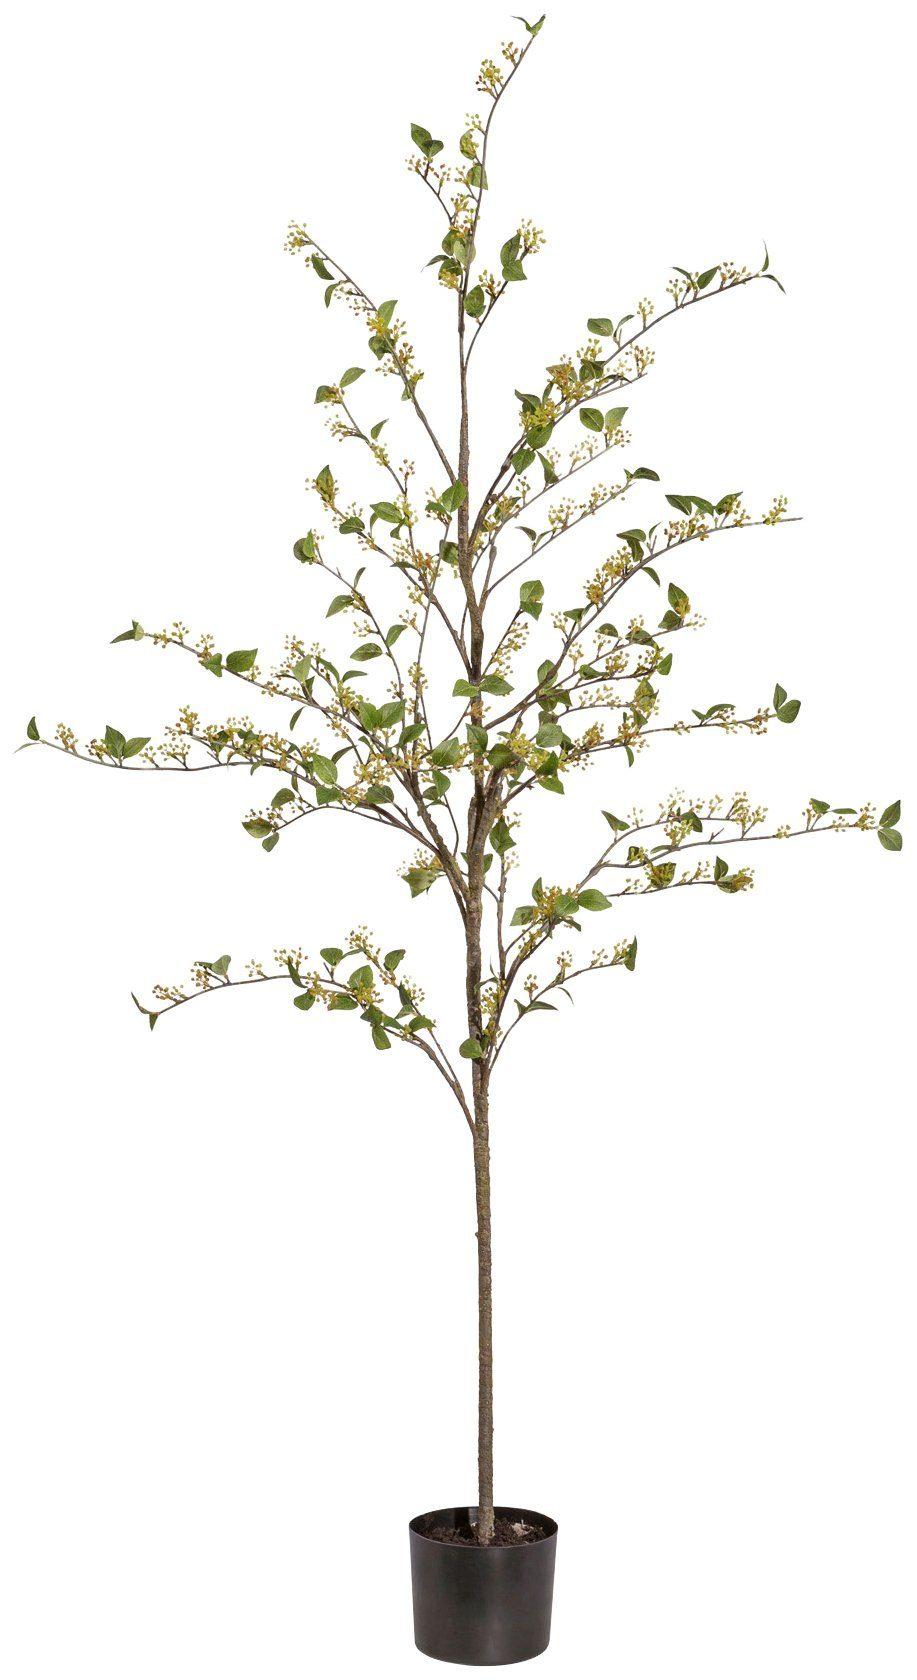 Kunstpflanze »Viburnum«, im Kunststofftopf, H: 180 cm